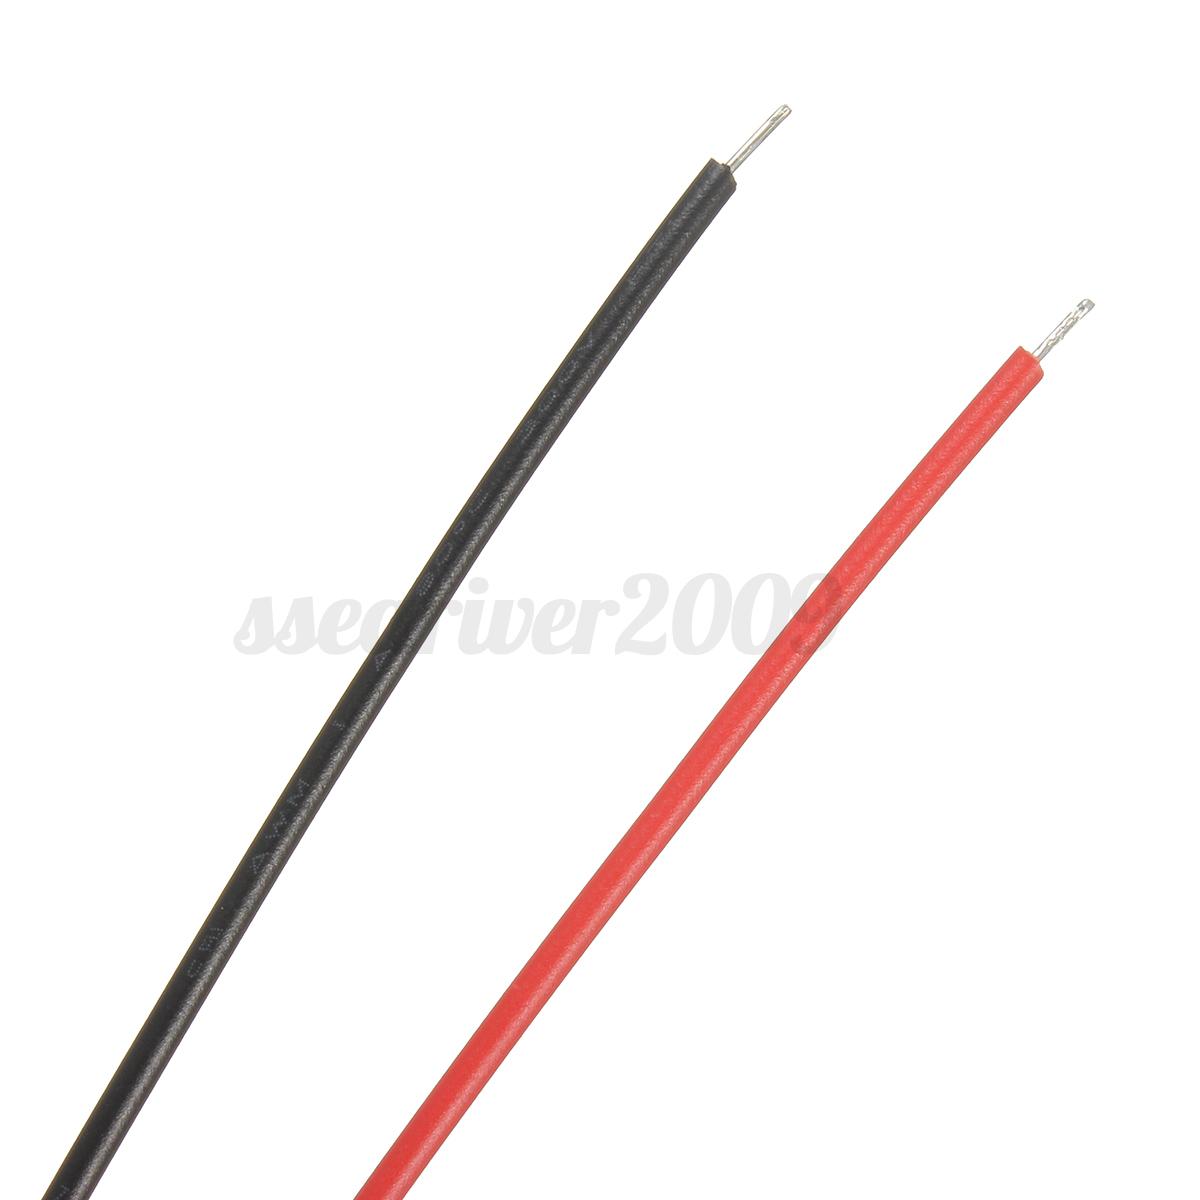 50 Sets Kit Mini Micro Jst 2 0mm Ph 2 Pin Connector Plug W